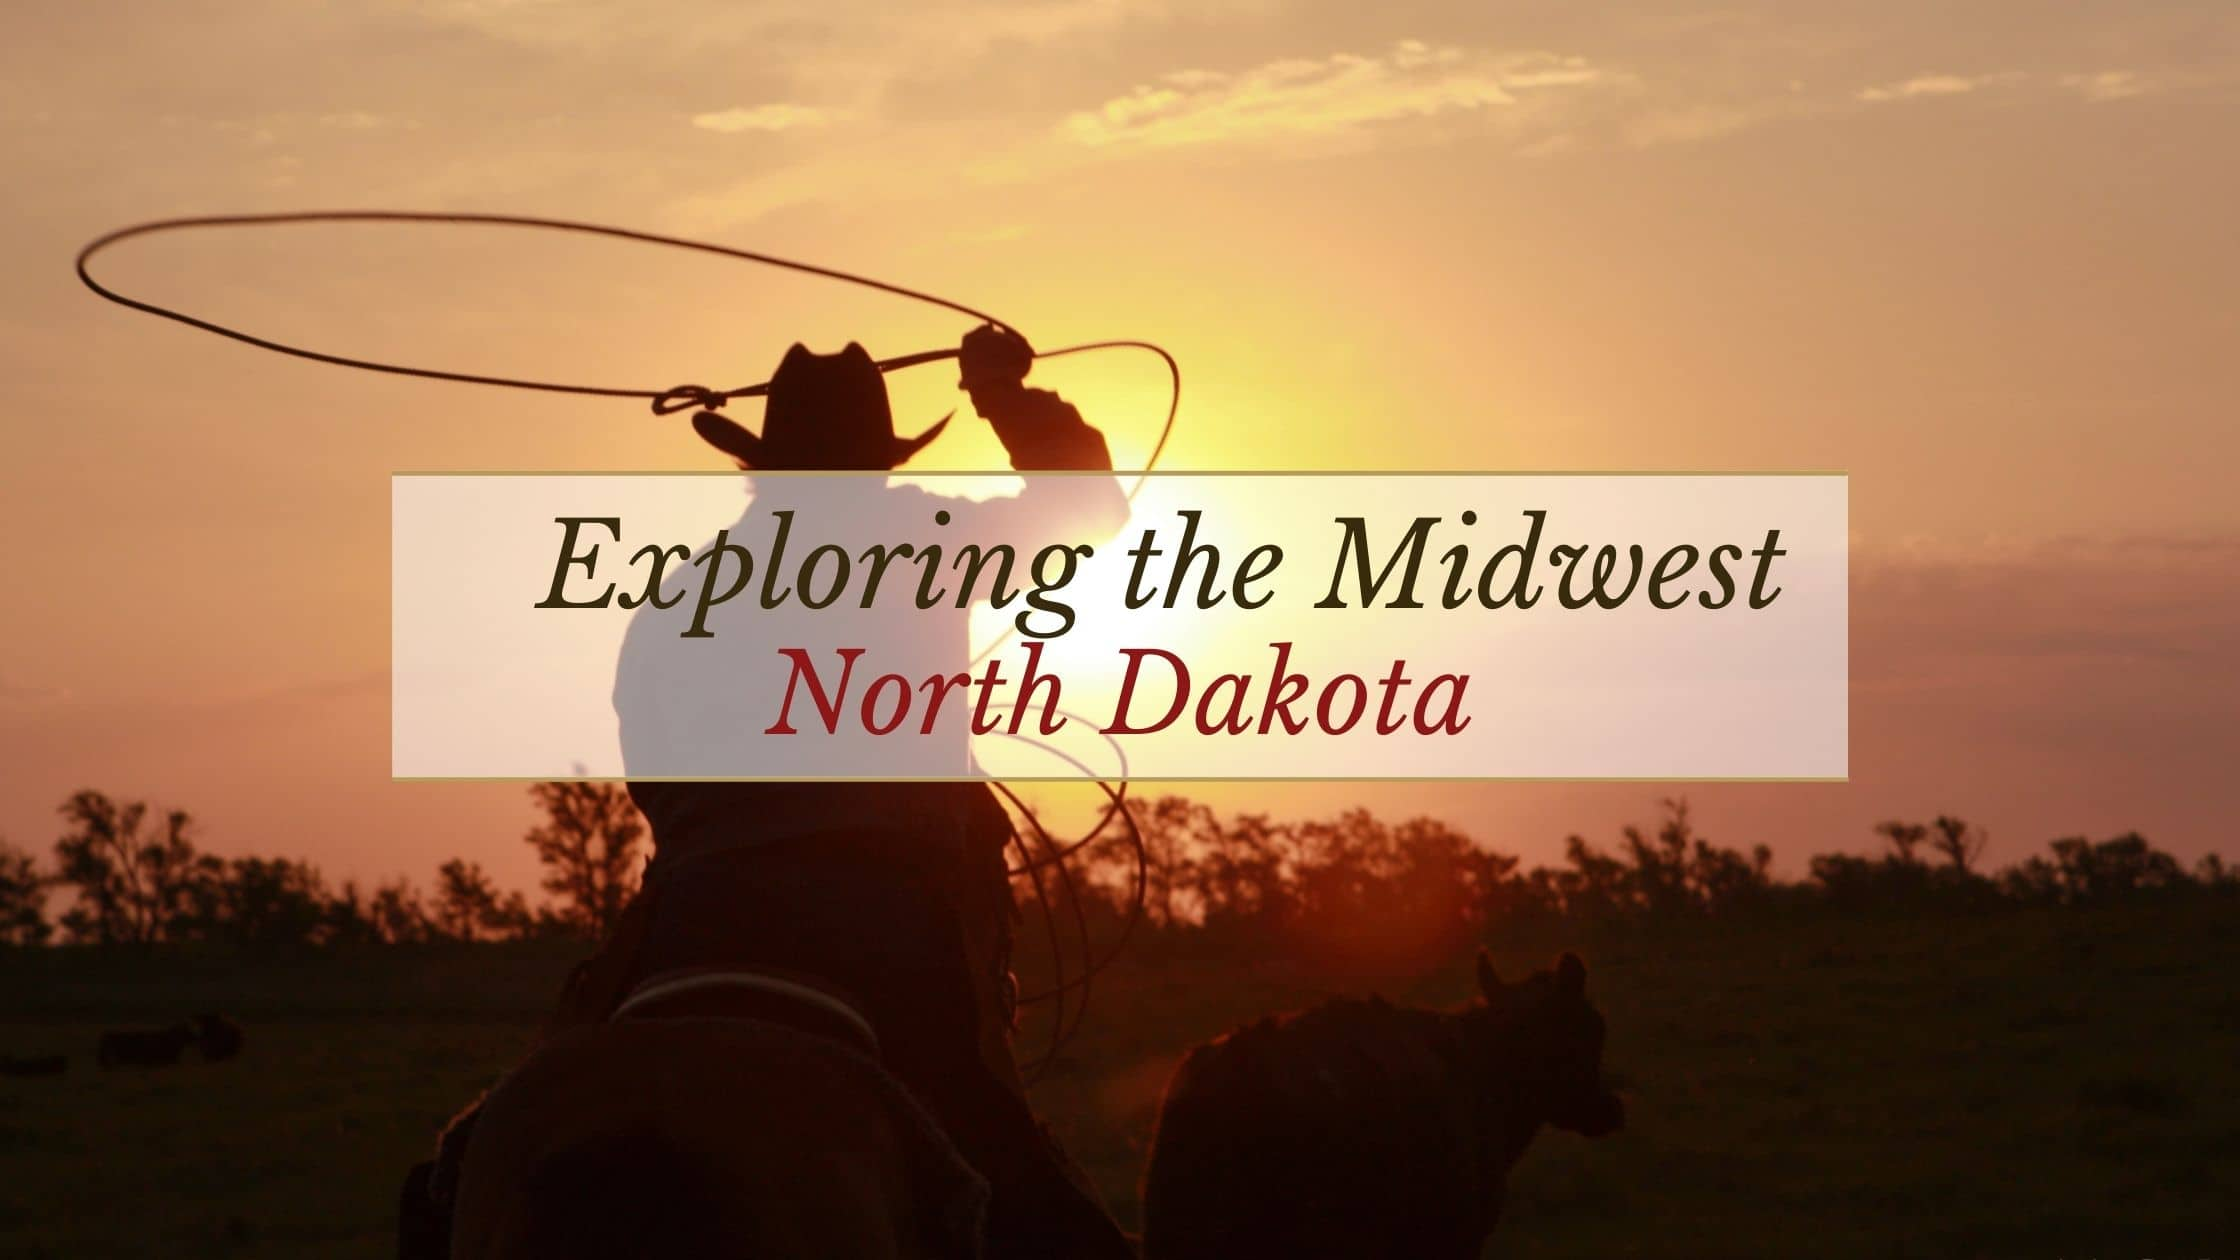 North Dakota Tourism | Exploring the Midwest Episode 6